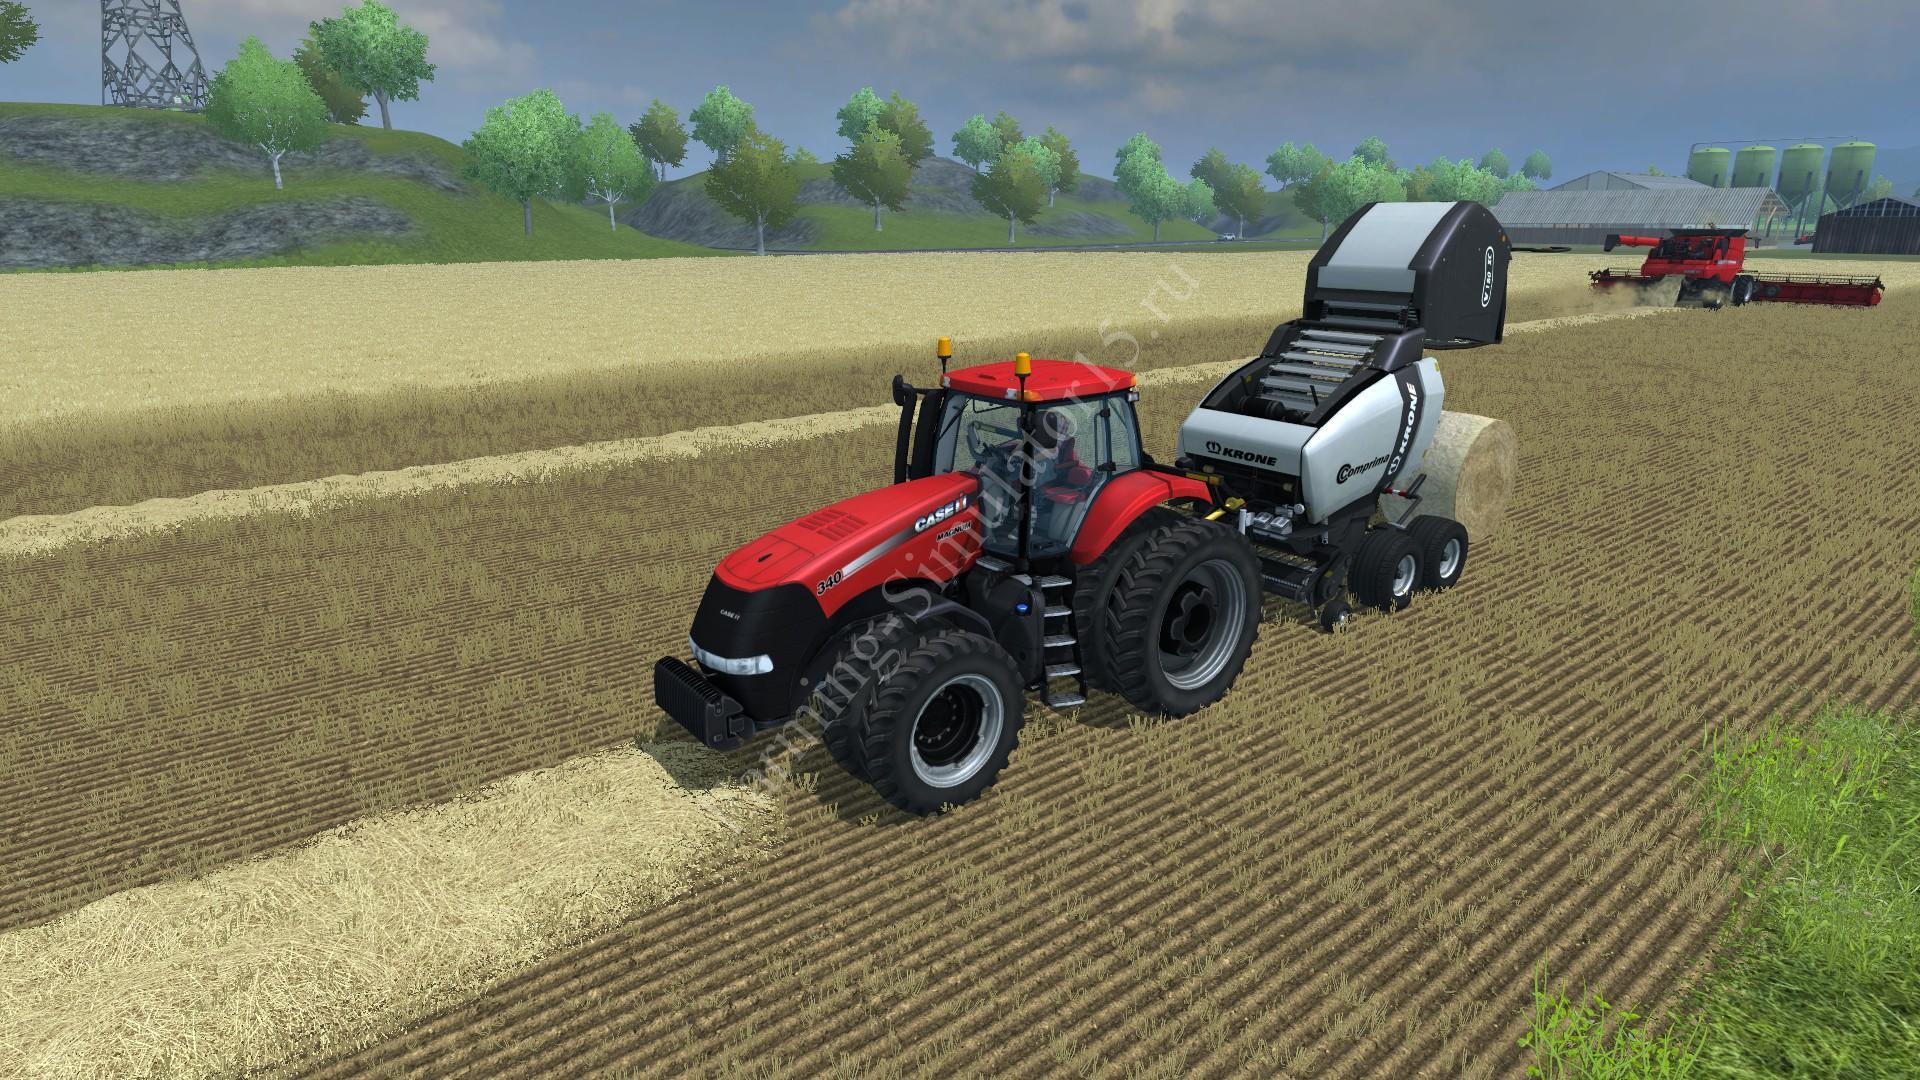 Мод тюкопресса Krone Comprima v180 Spezial v 1.0 Farming Simulator 2013, Farming Simulator 13